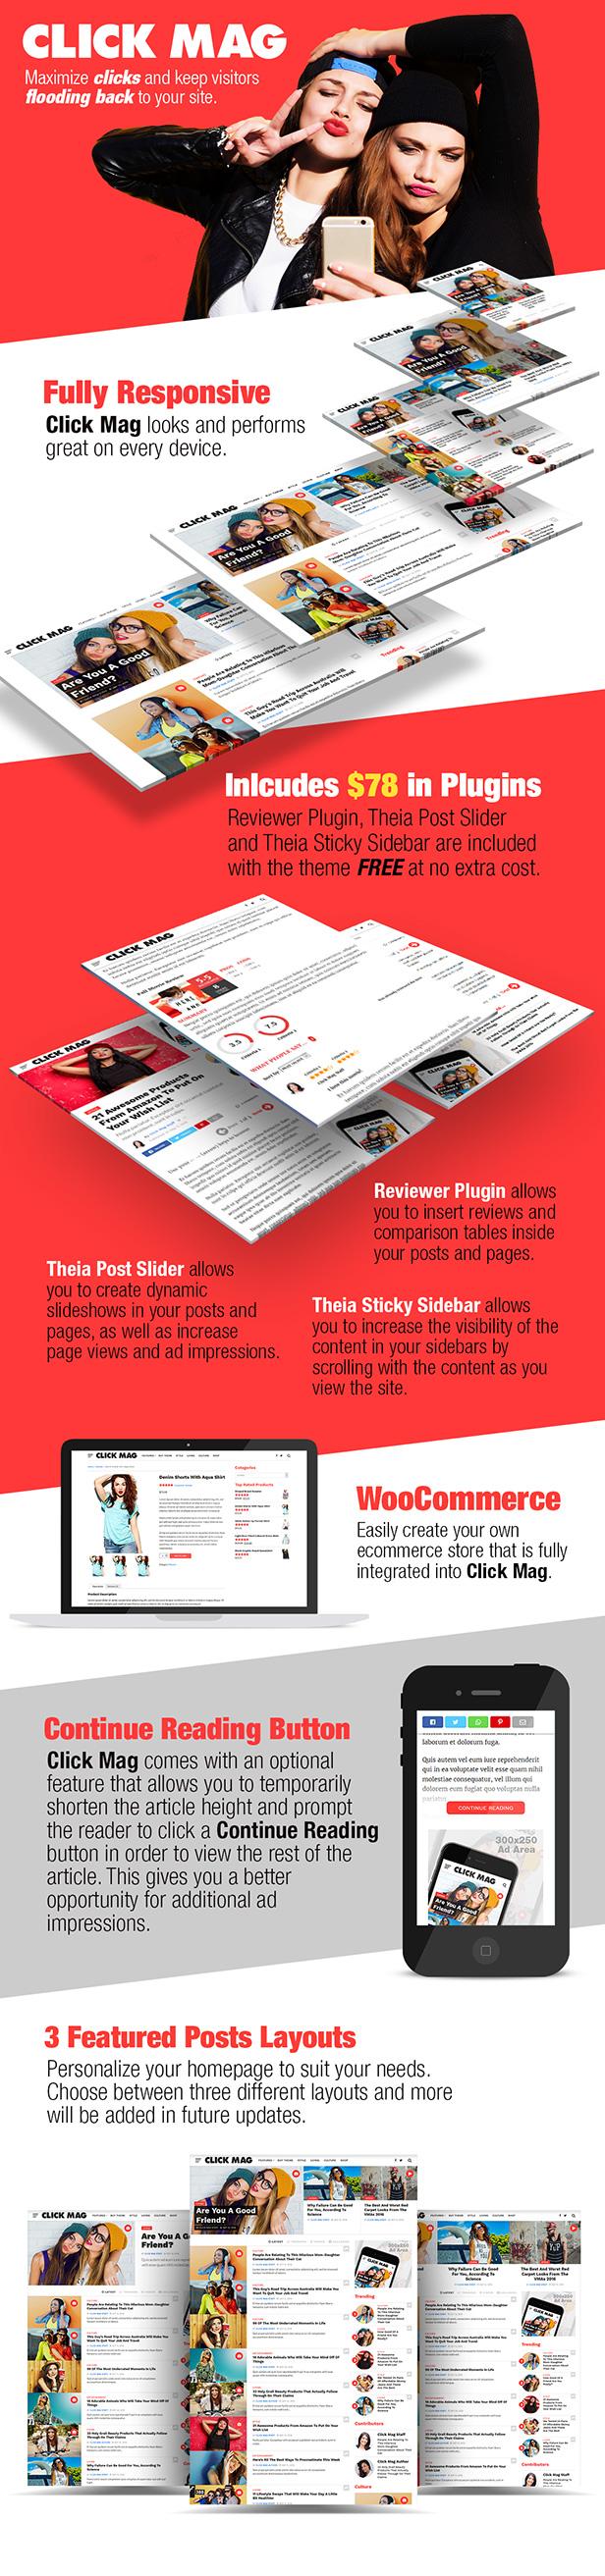 click mag feat - Click Mag - Viral WordPress News Magazine/Blog Theme